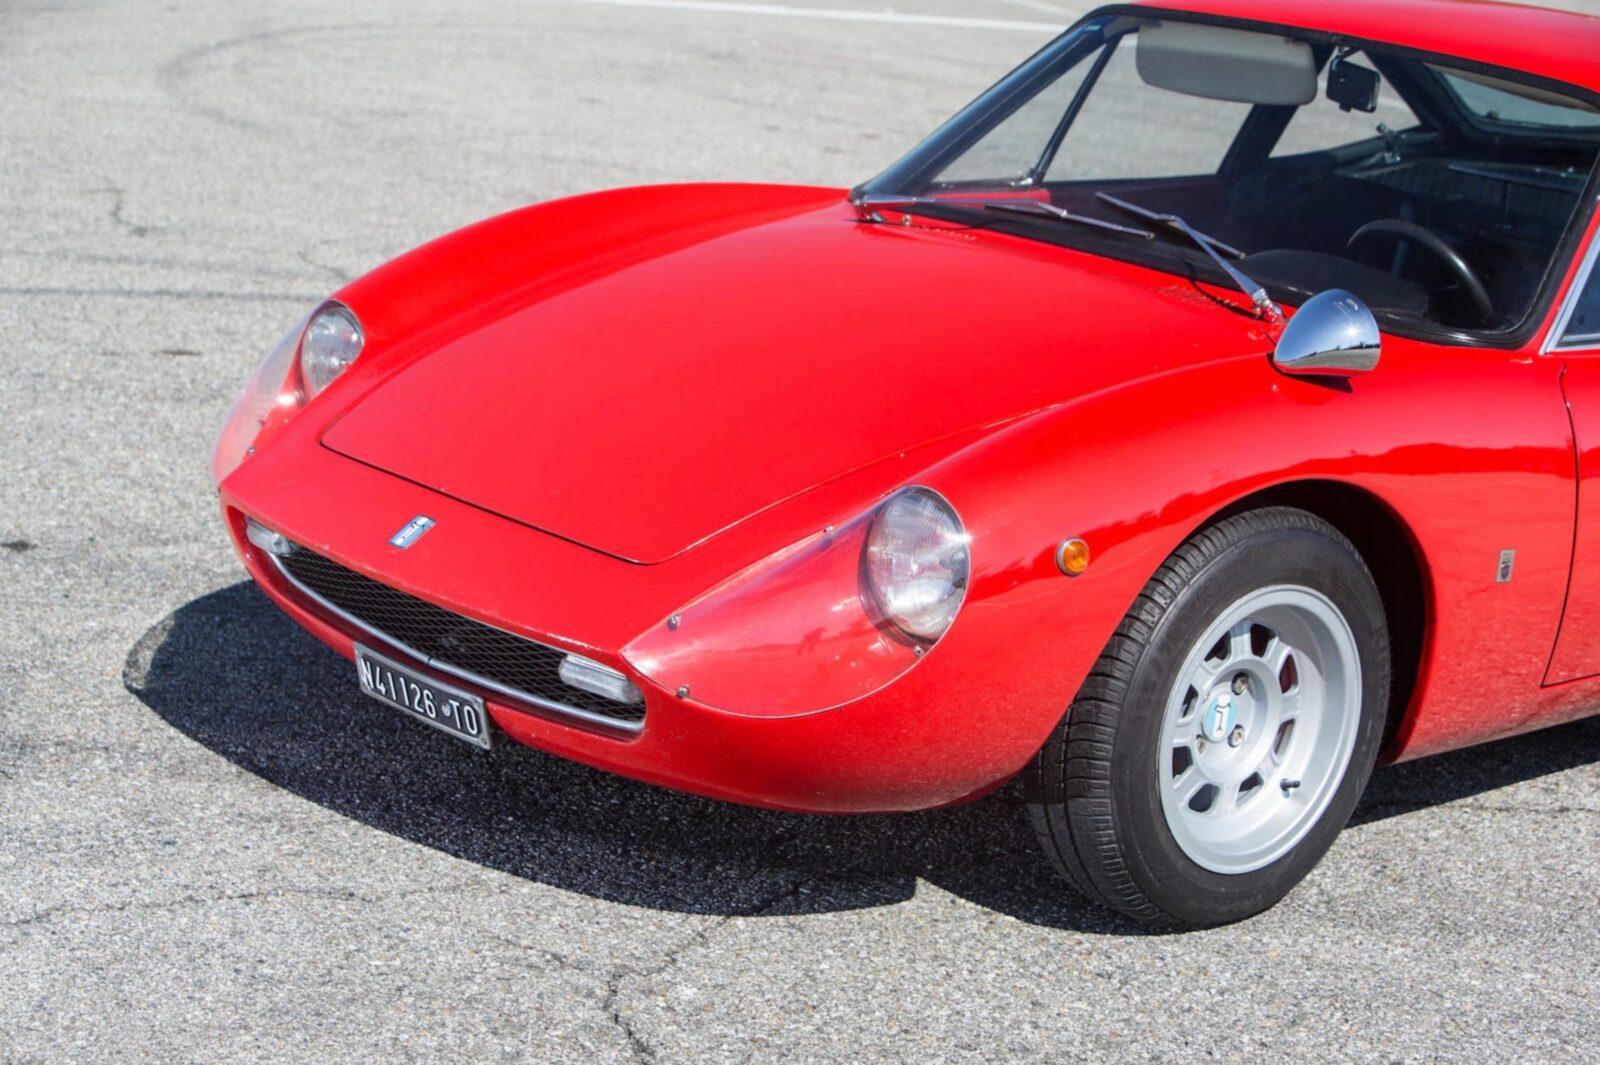 de tomaso vallelunga car 21 1600x1065 - 1967 De Tomaso Vallelunga